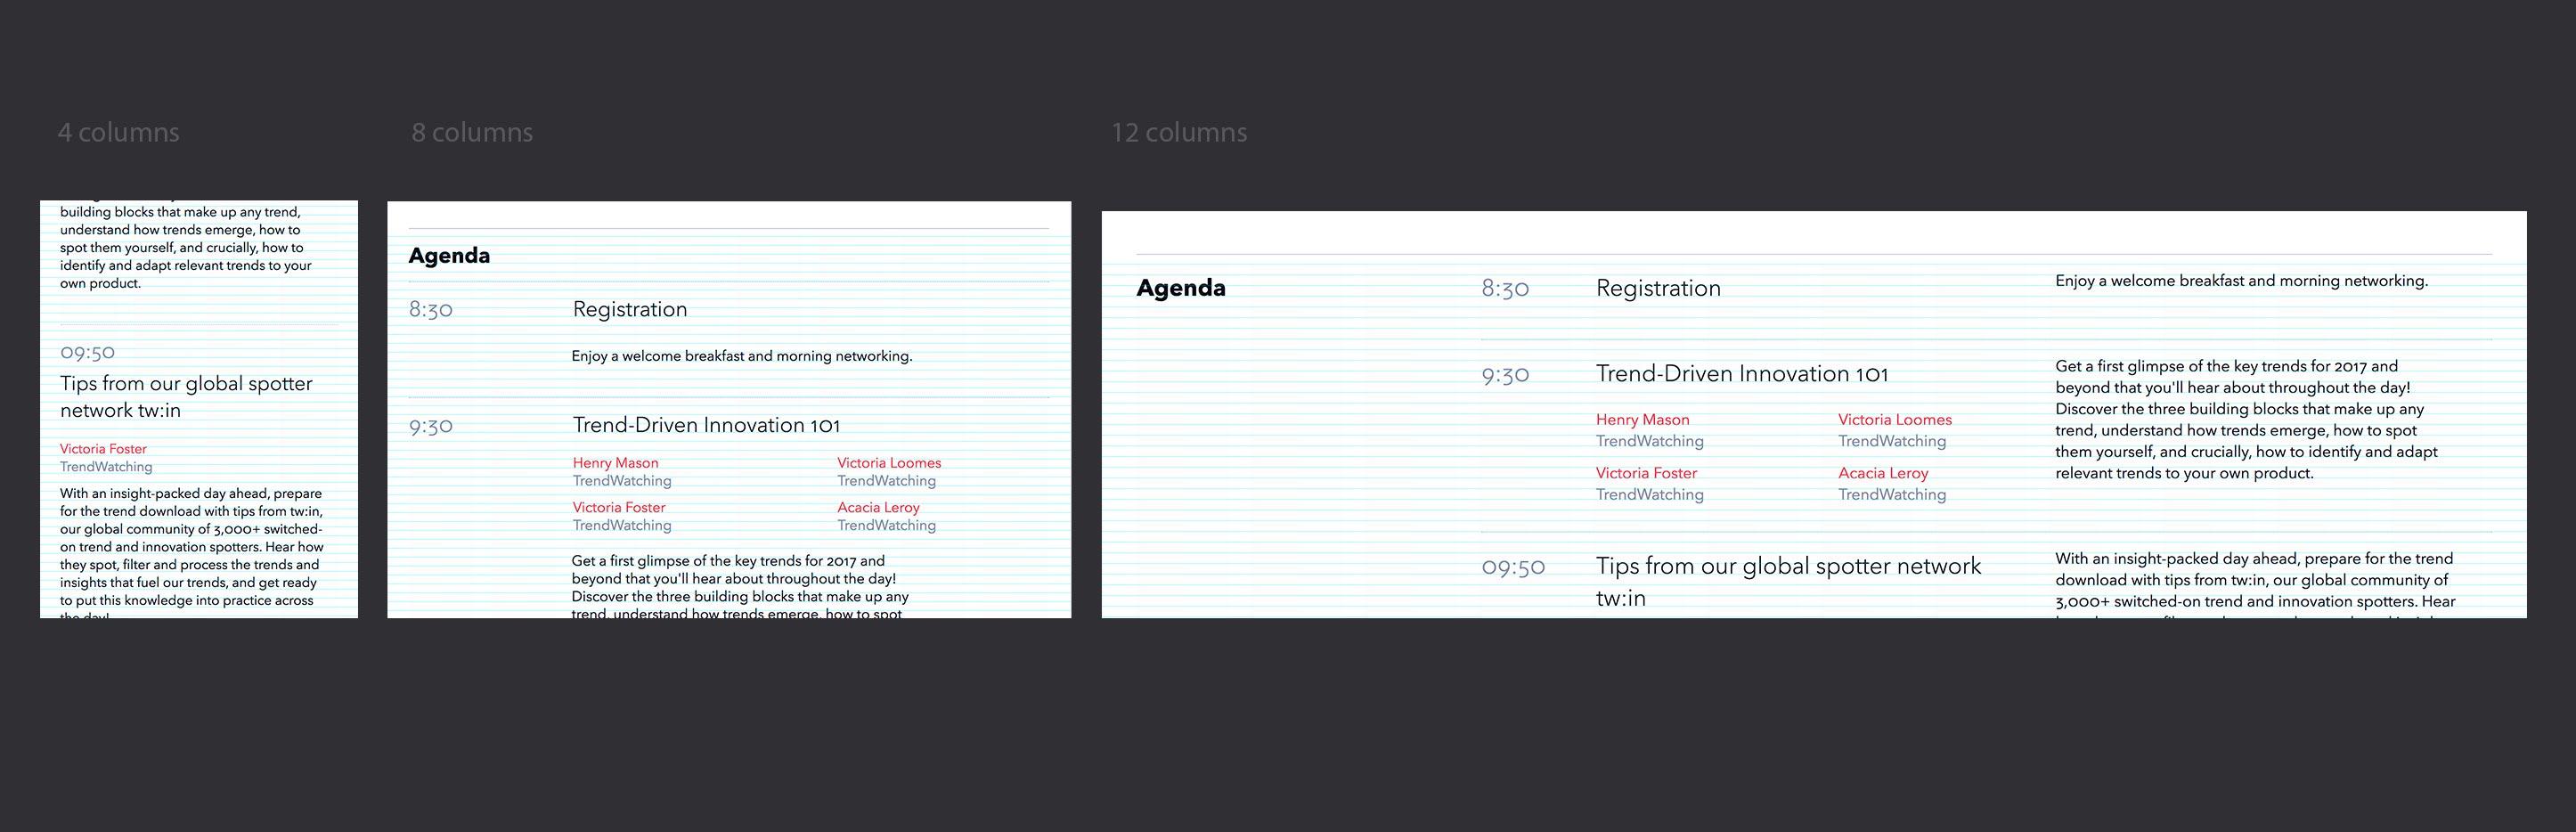 agenda--baseline-grid